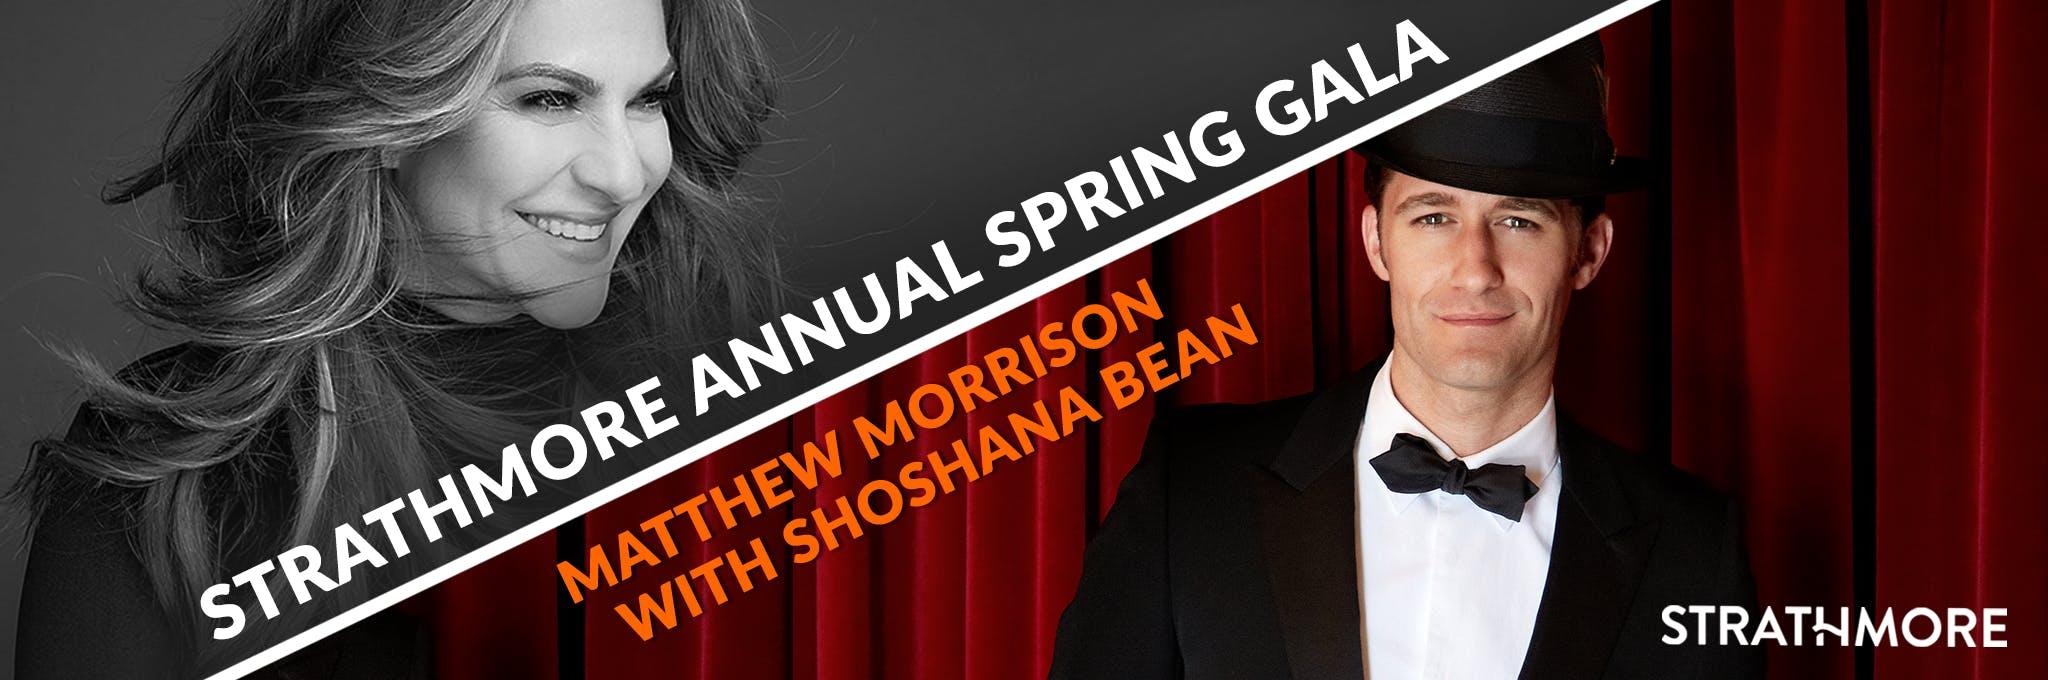 Matthew Morrison with Shoshana Bean: Strathmore Annual Spring Gala Logo